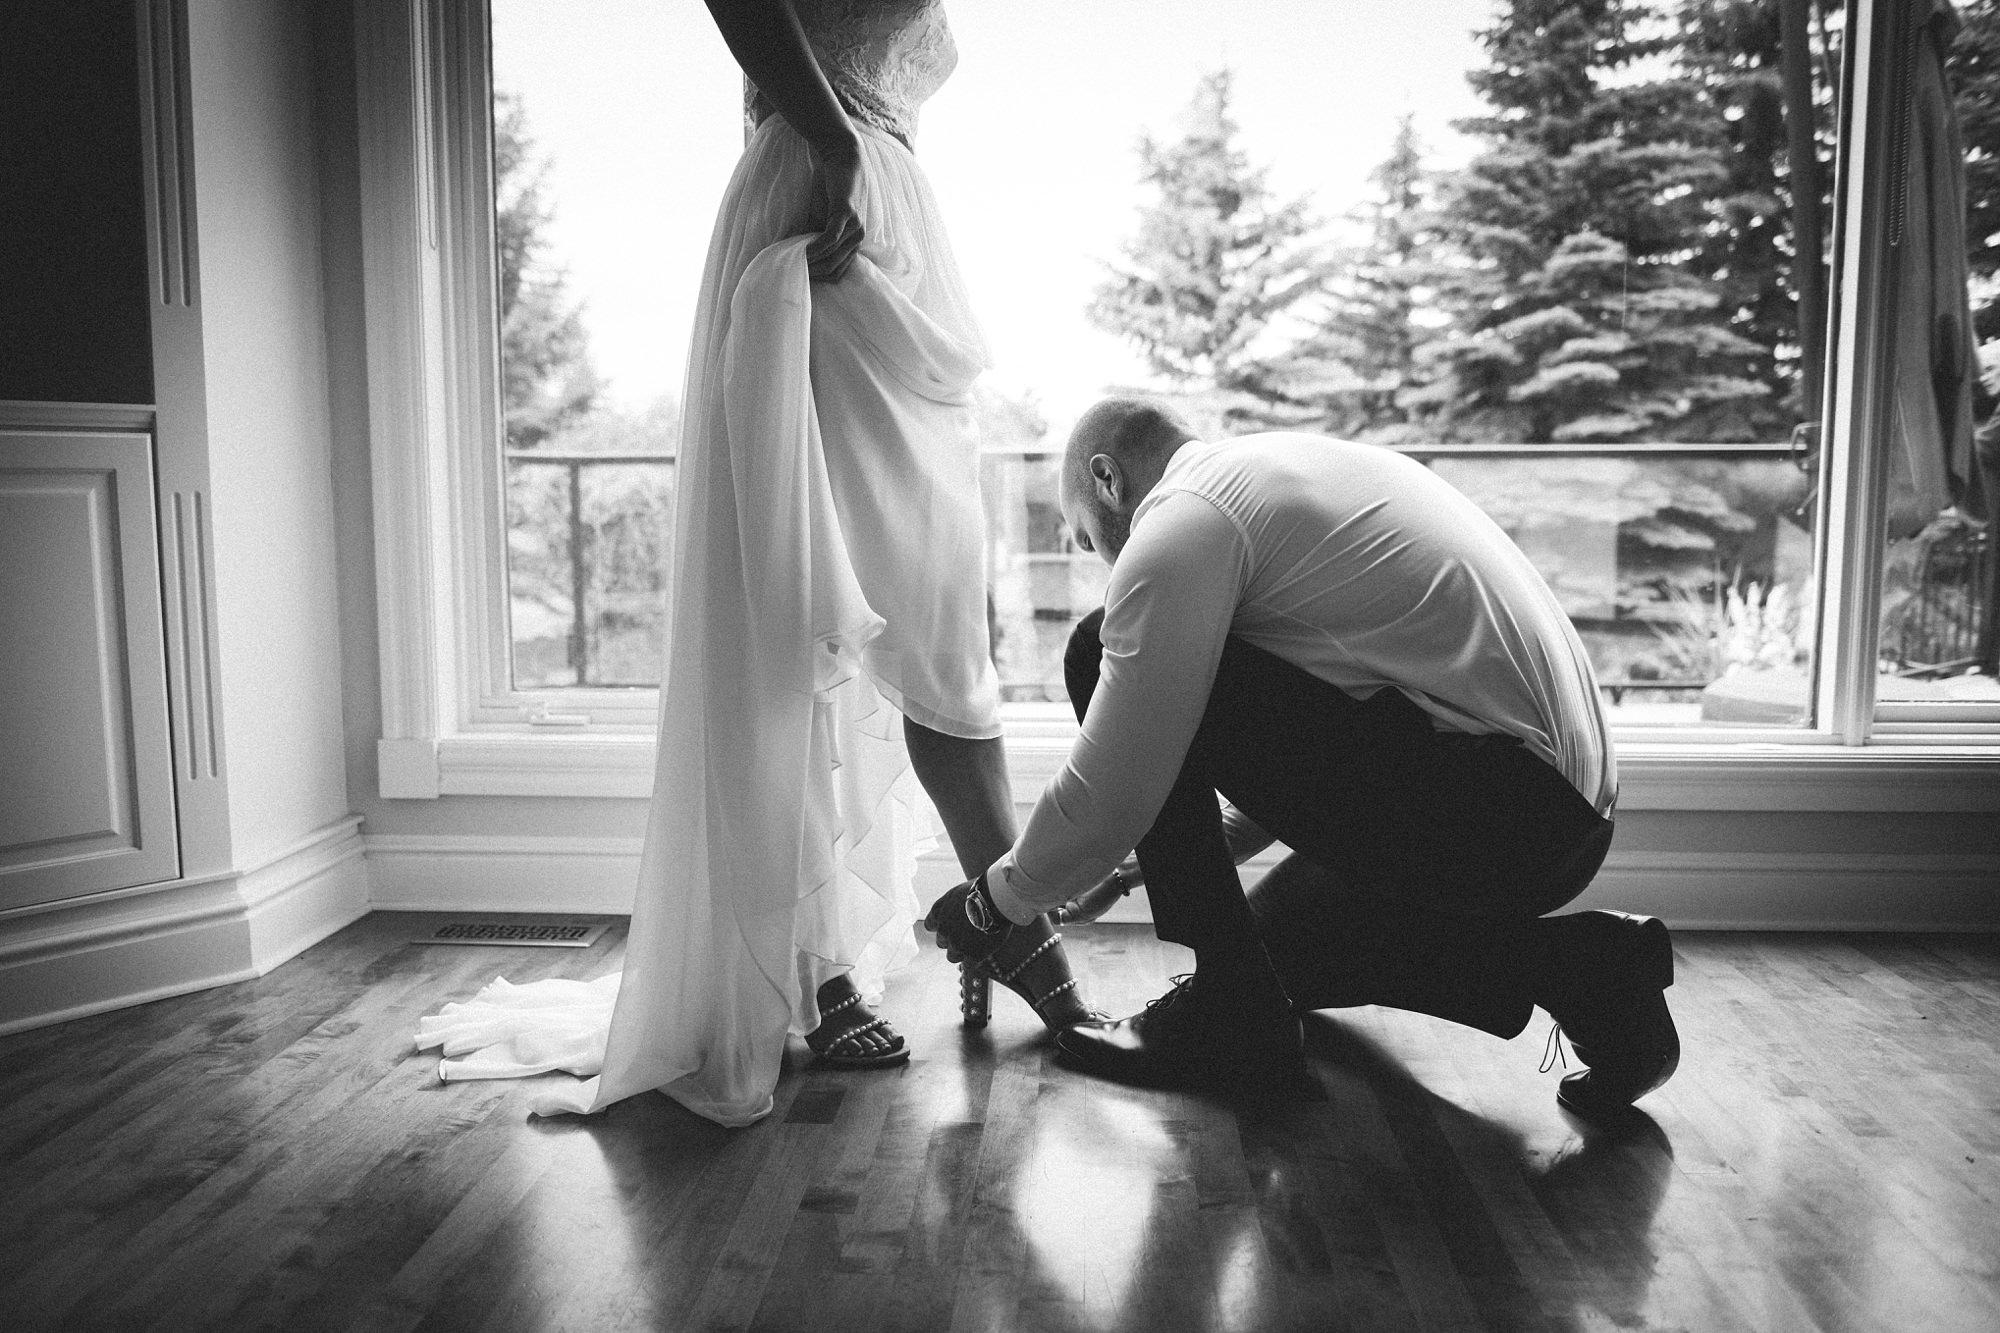 Bride getting shoe done by groomsman in backyard wedding in calgary